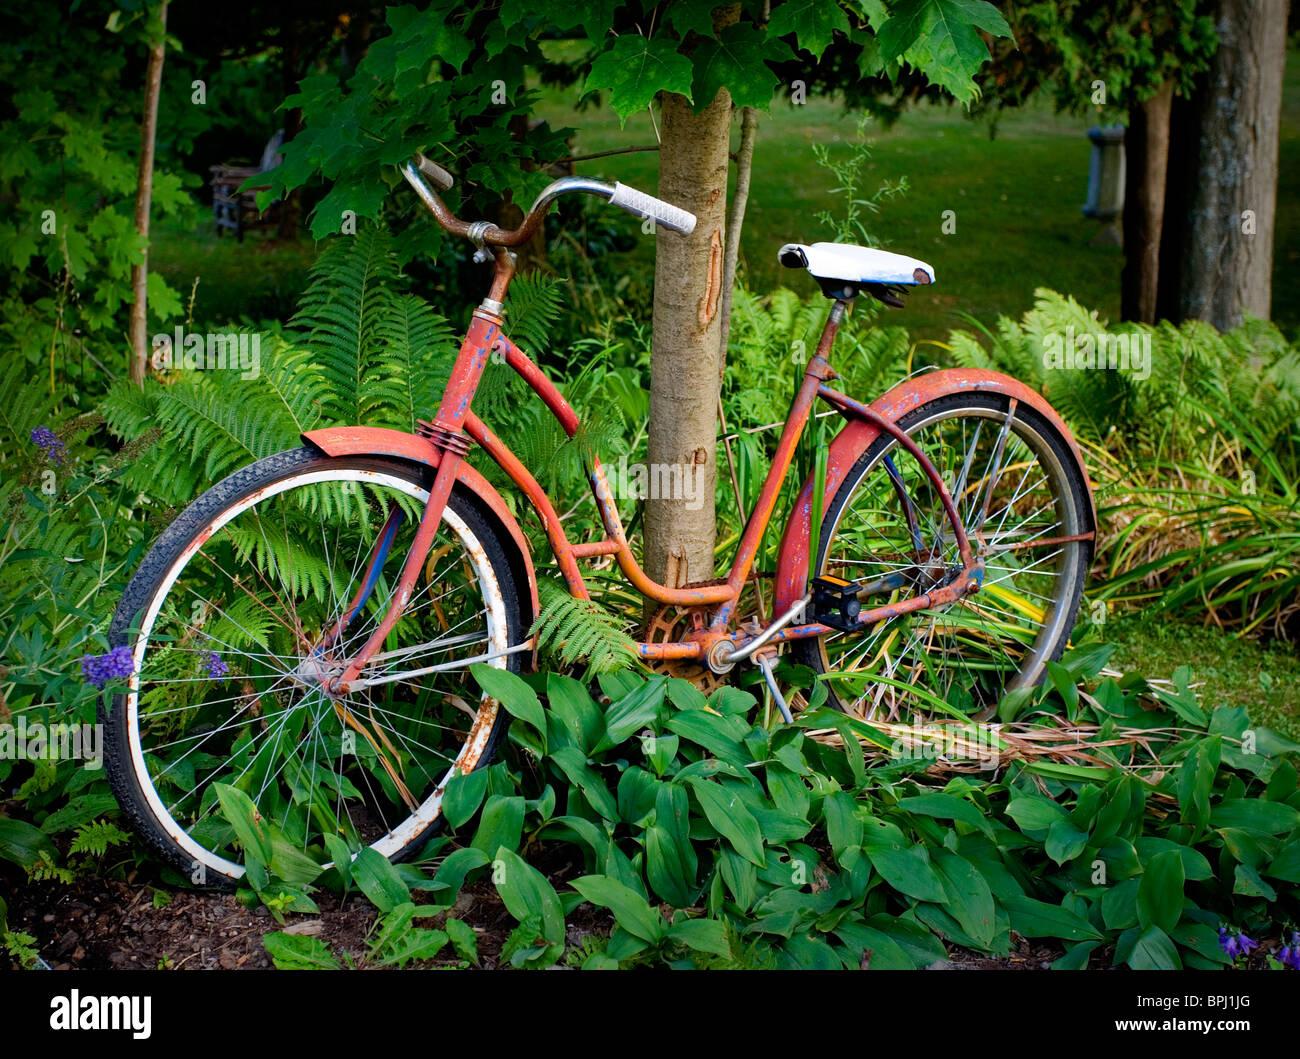 Rotes Fahrrad an Baum gelehnt Stockbild